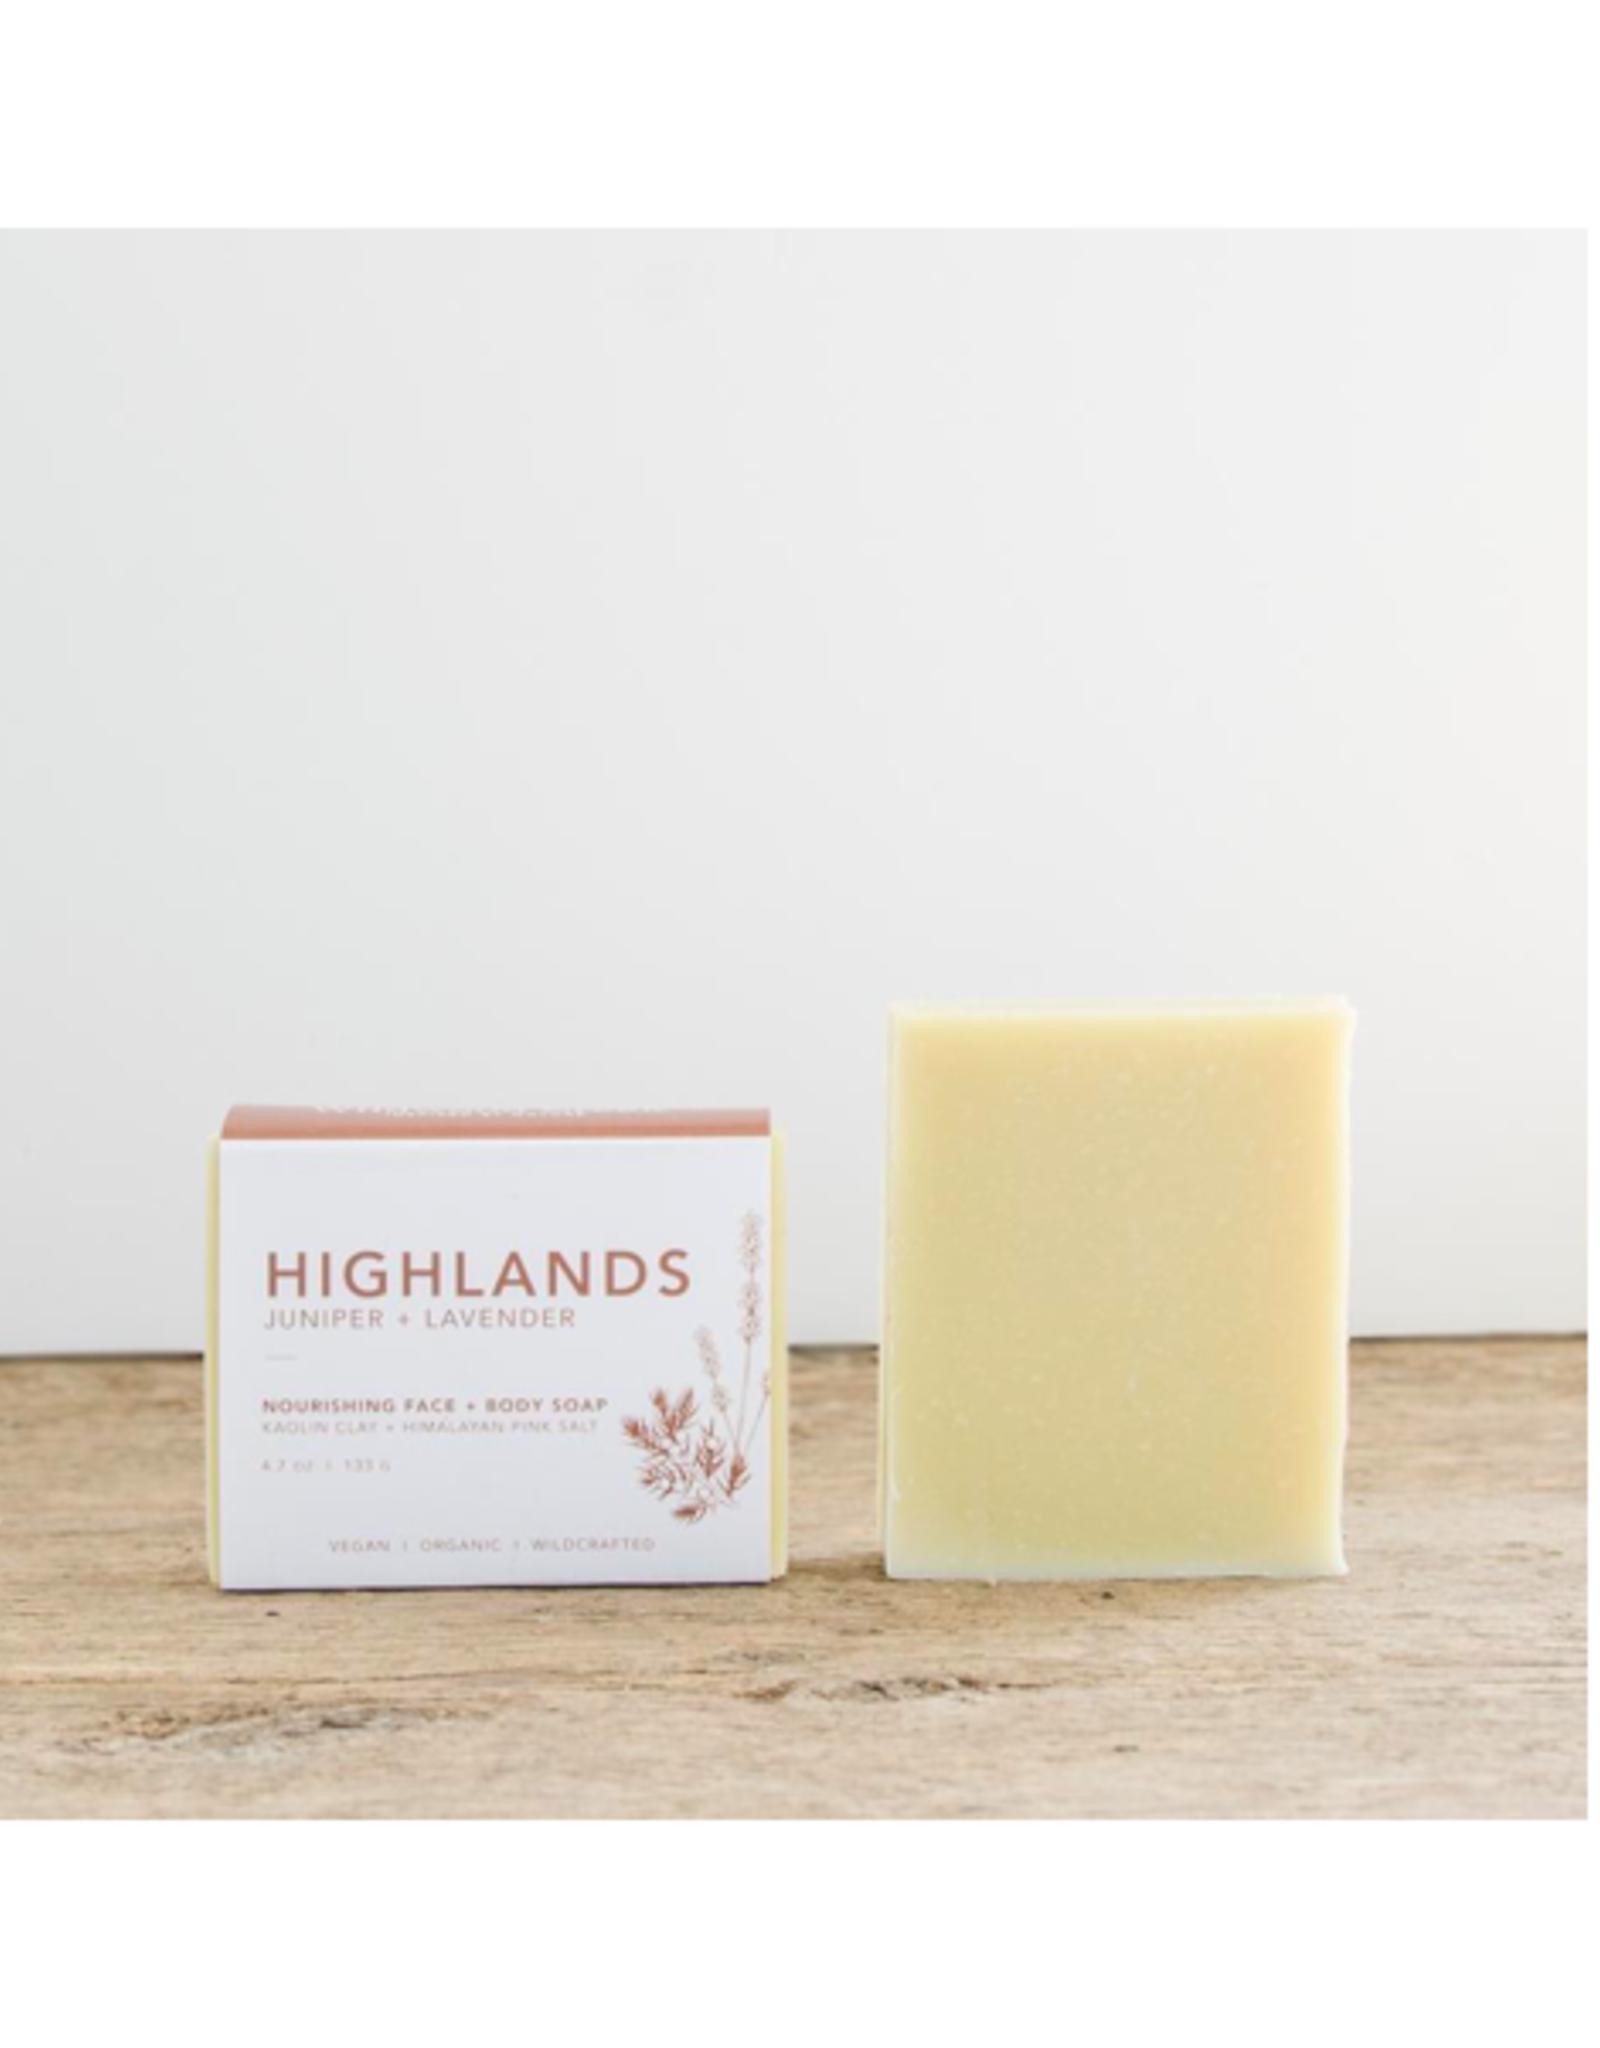 Wildwood Creek - Bar Soap / Highlands, 4.7oz